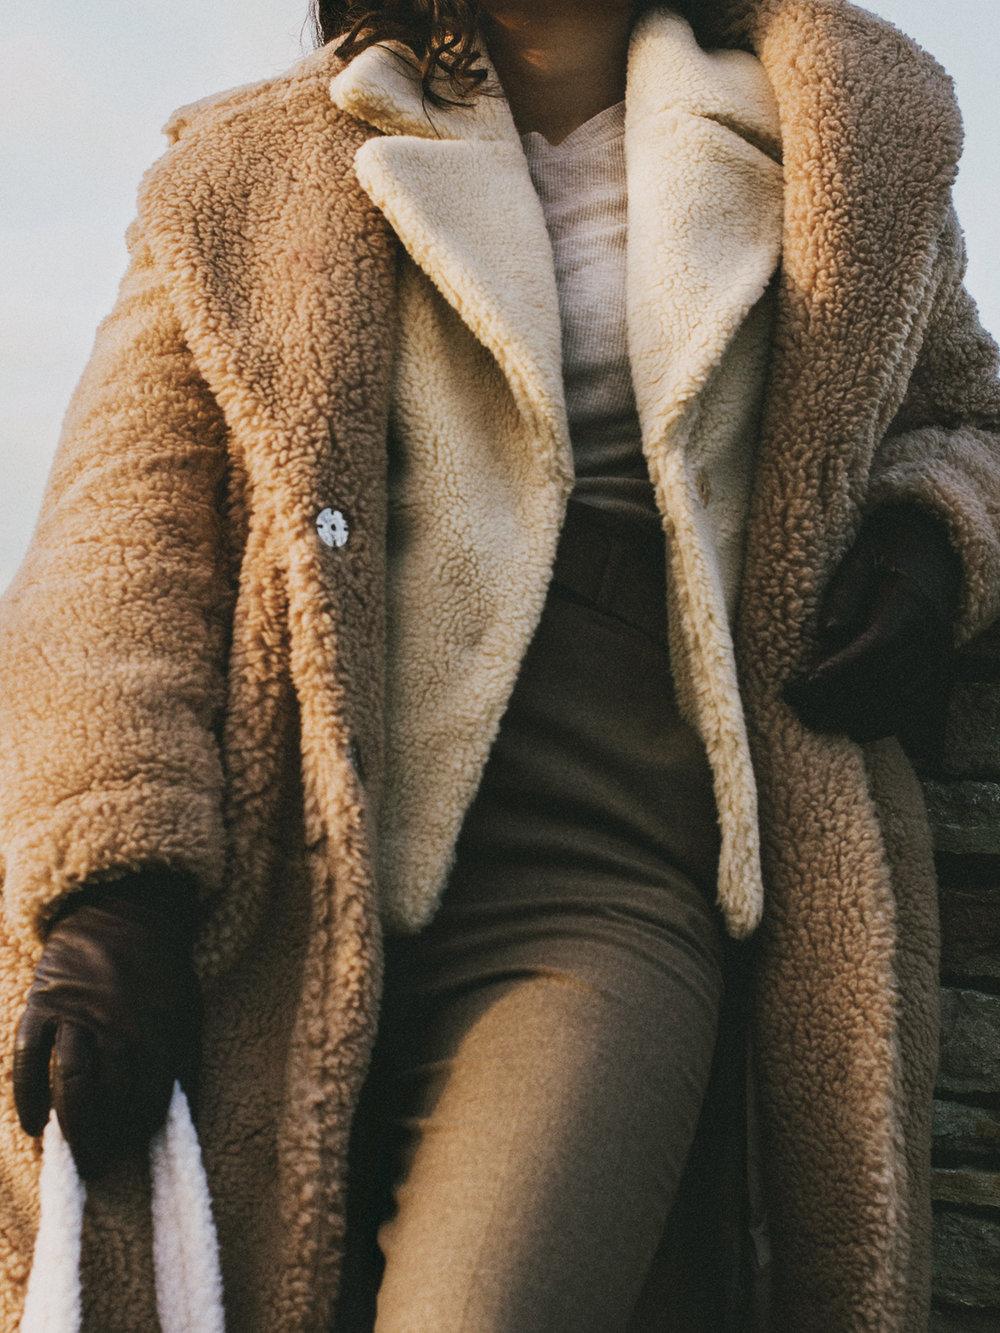 Coat H&M & SVEA, Top and gloves H&M, Trousers ZARA, Bag SVEA